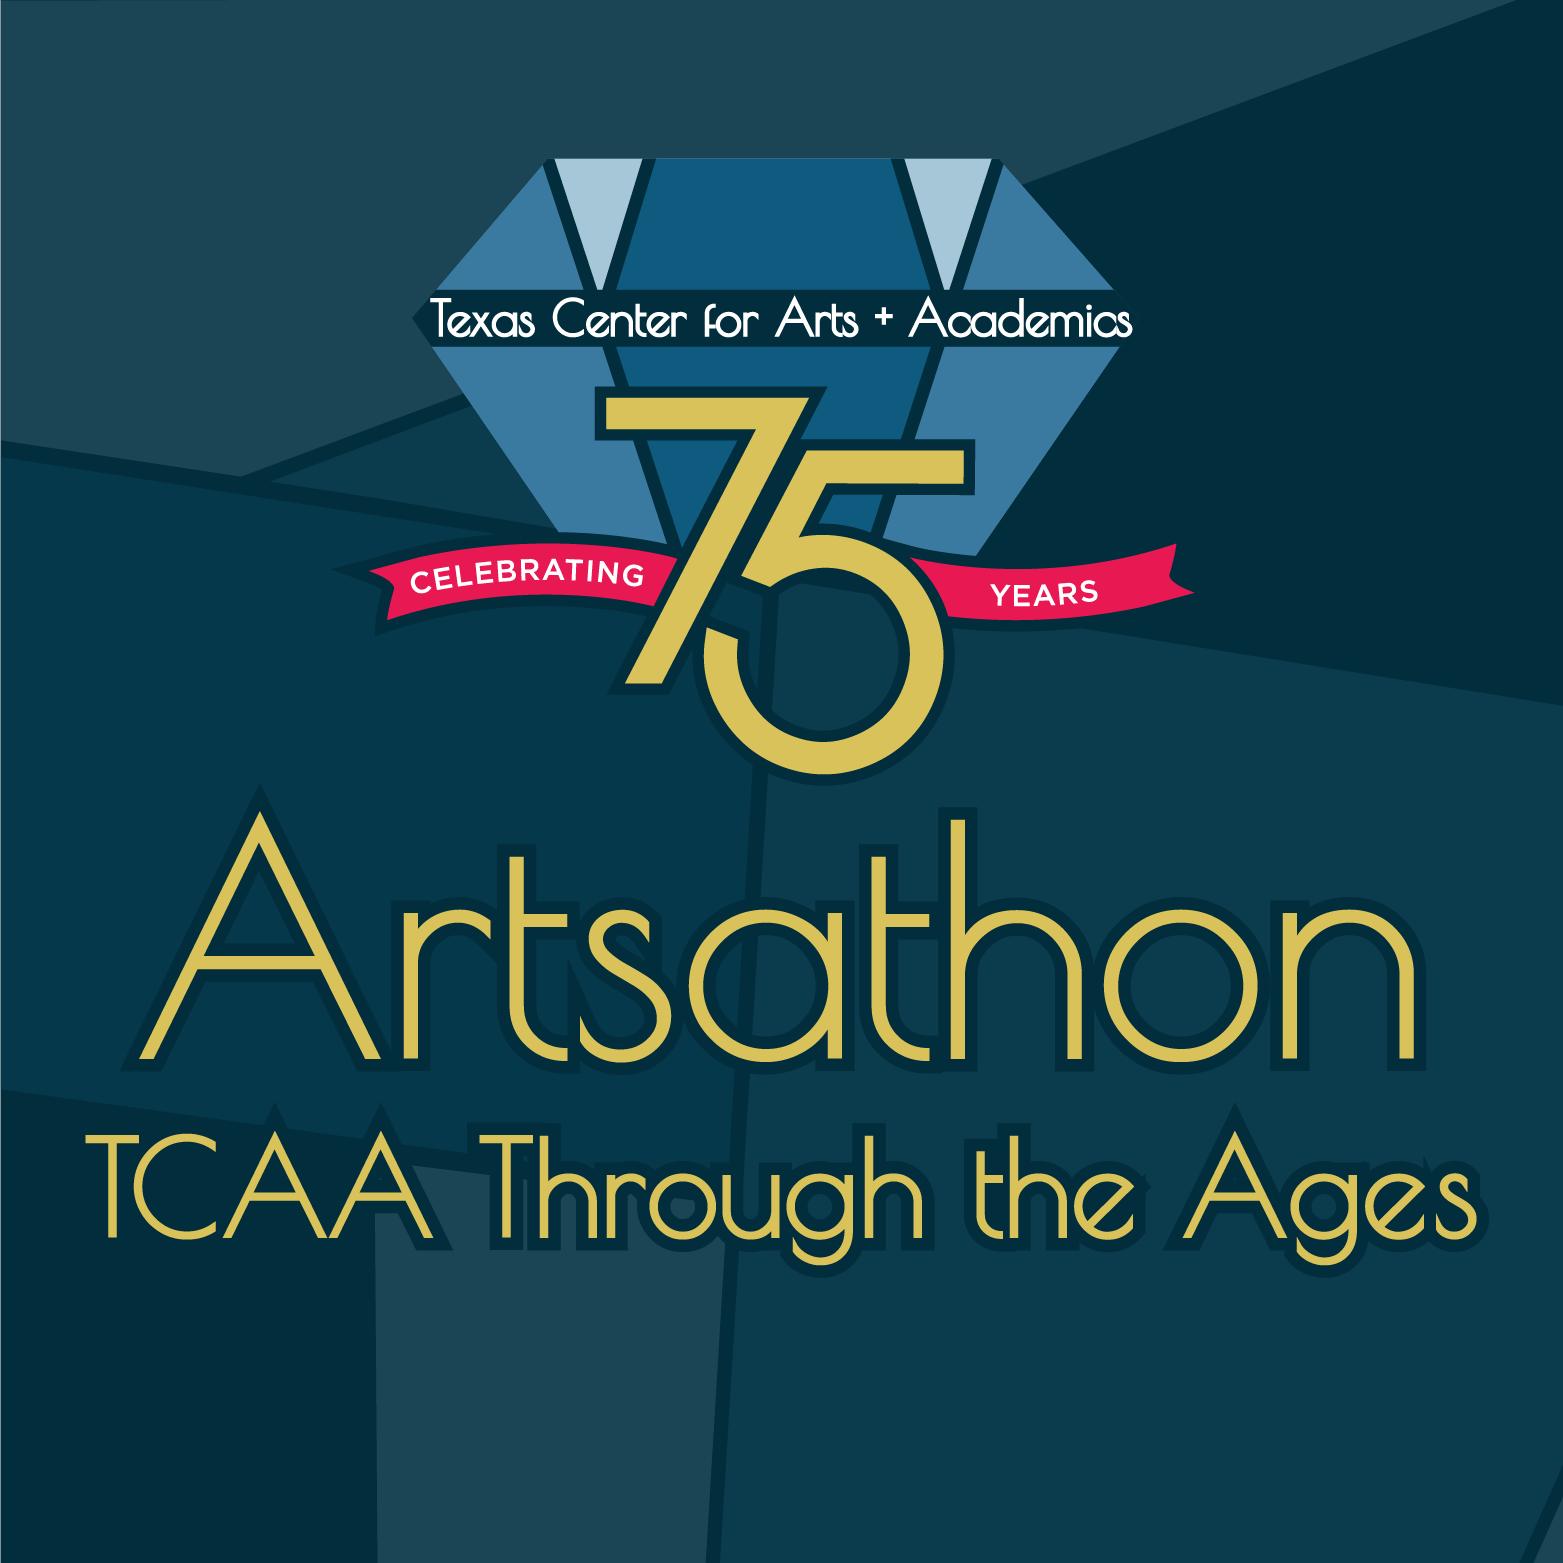 Artsathon - TCAA Through the Ages